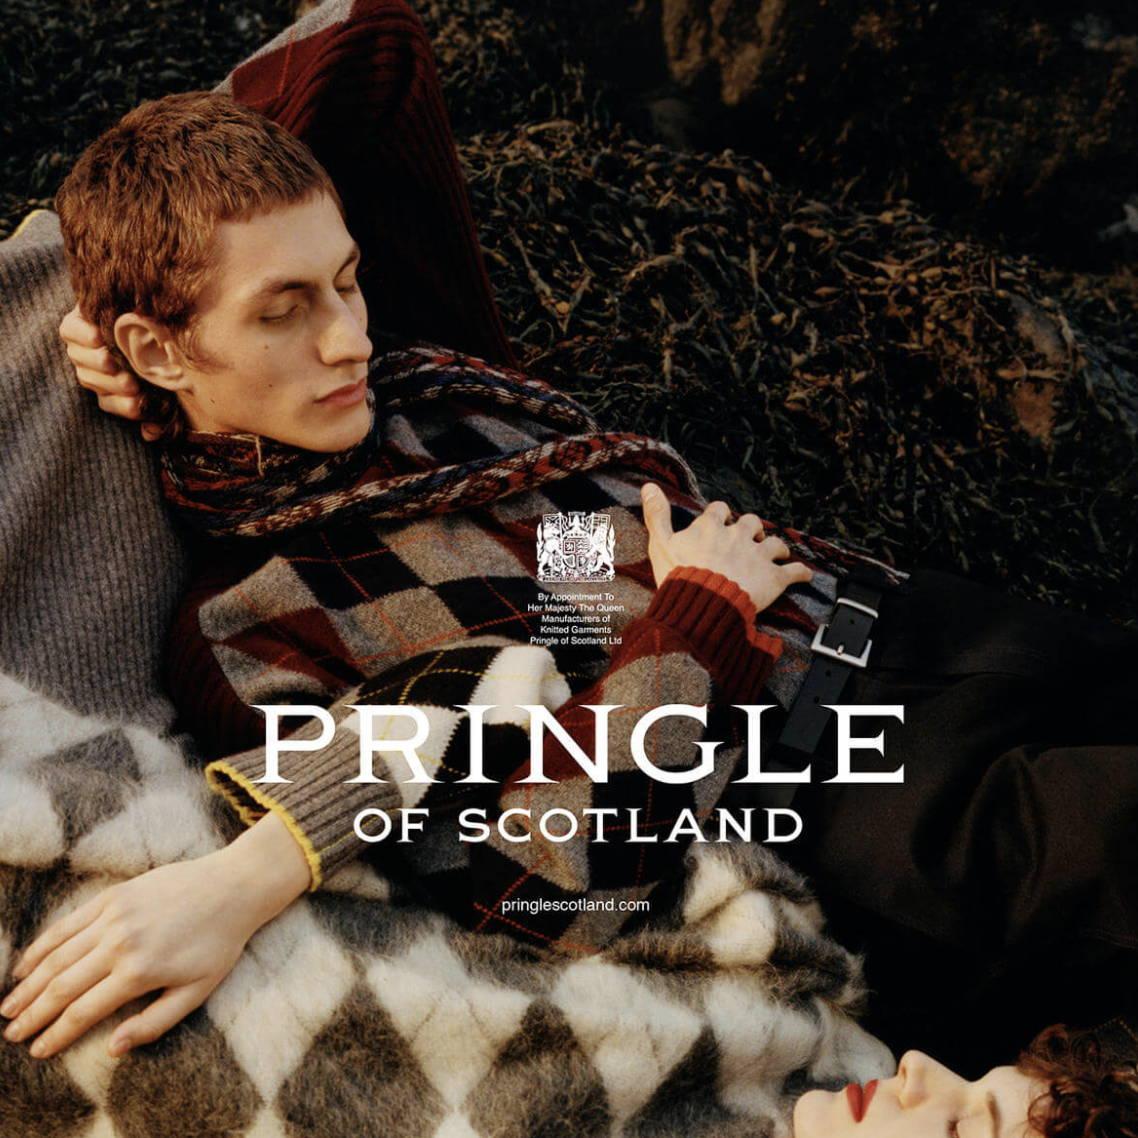 pringle of scotland